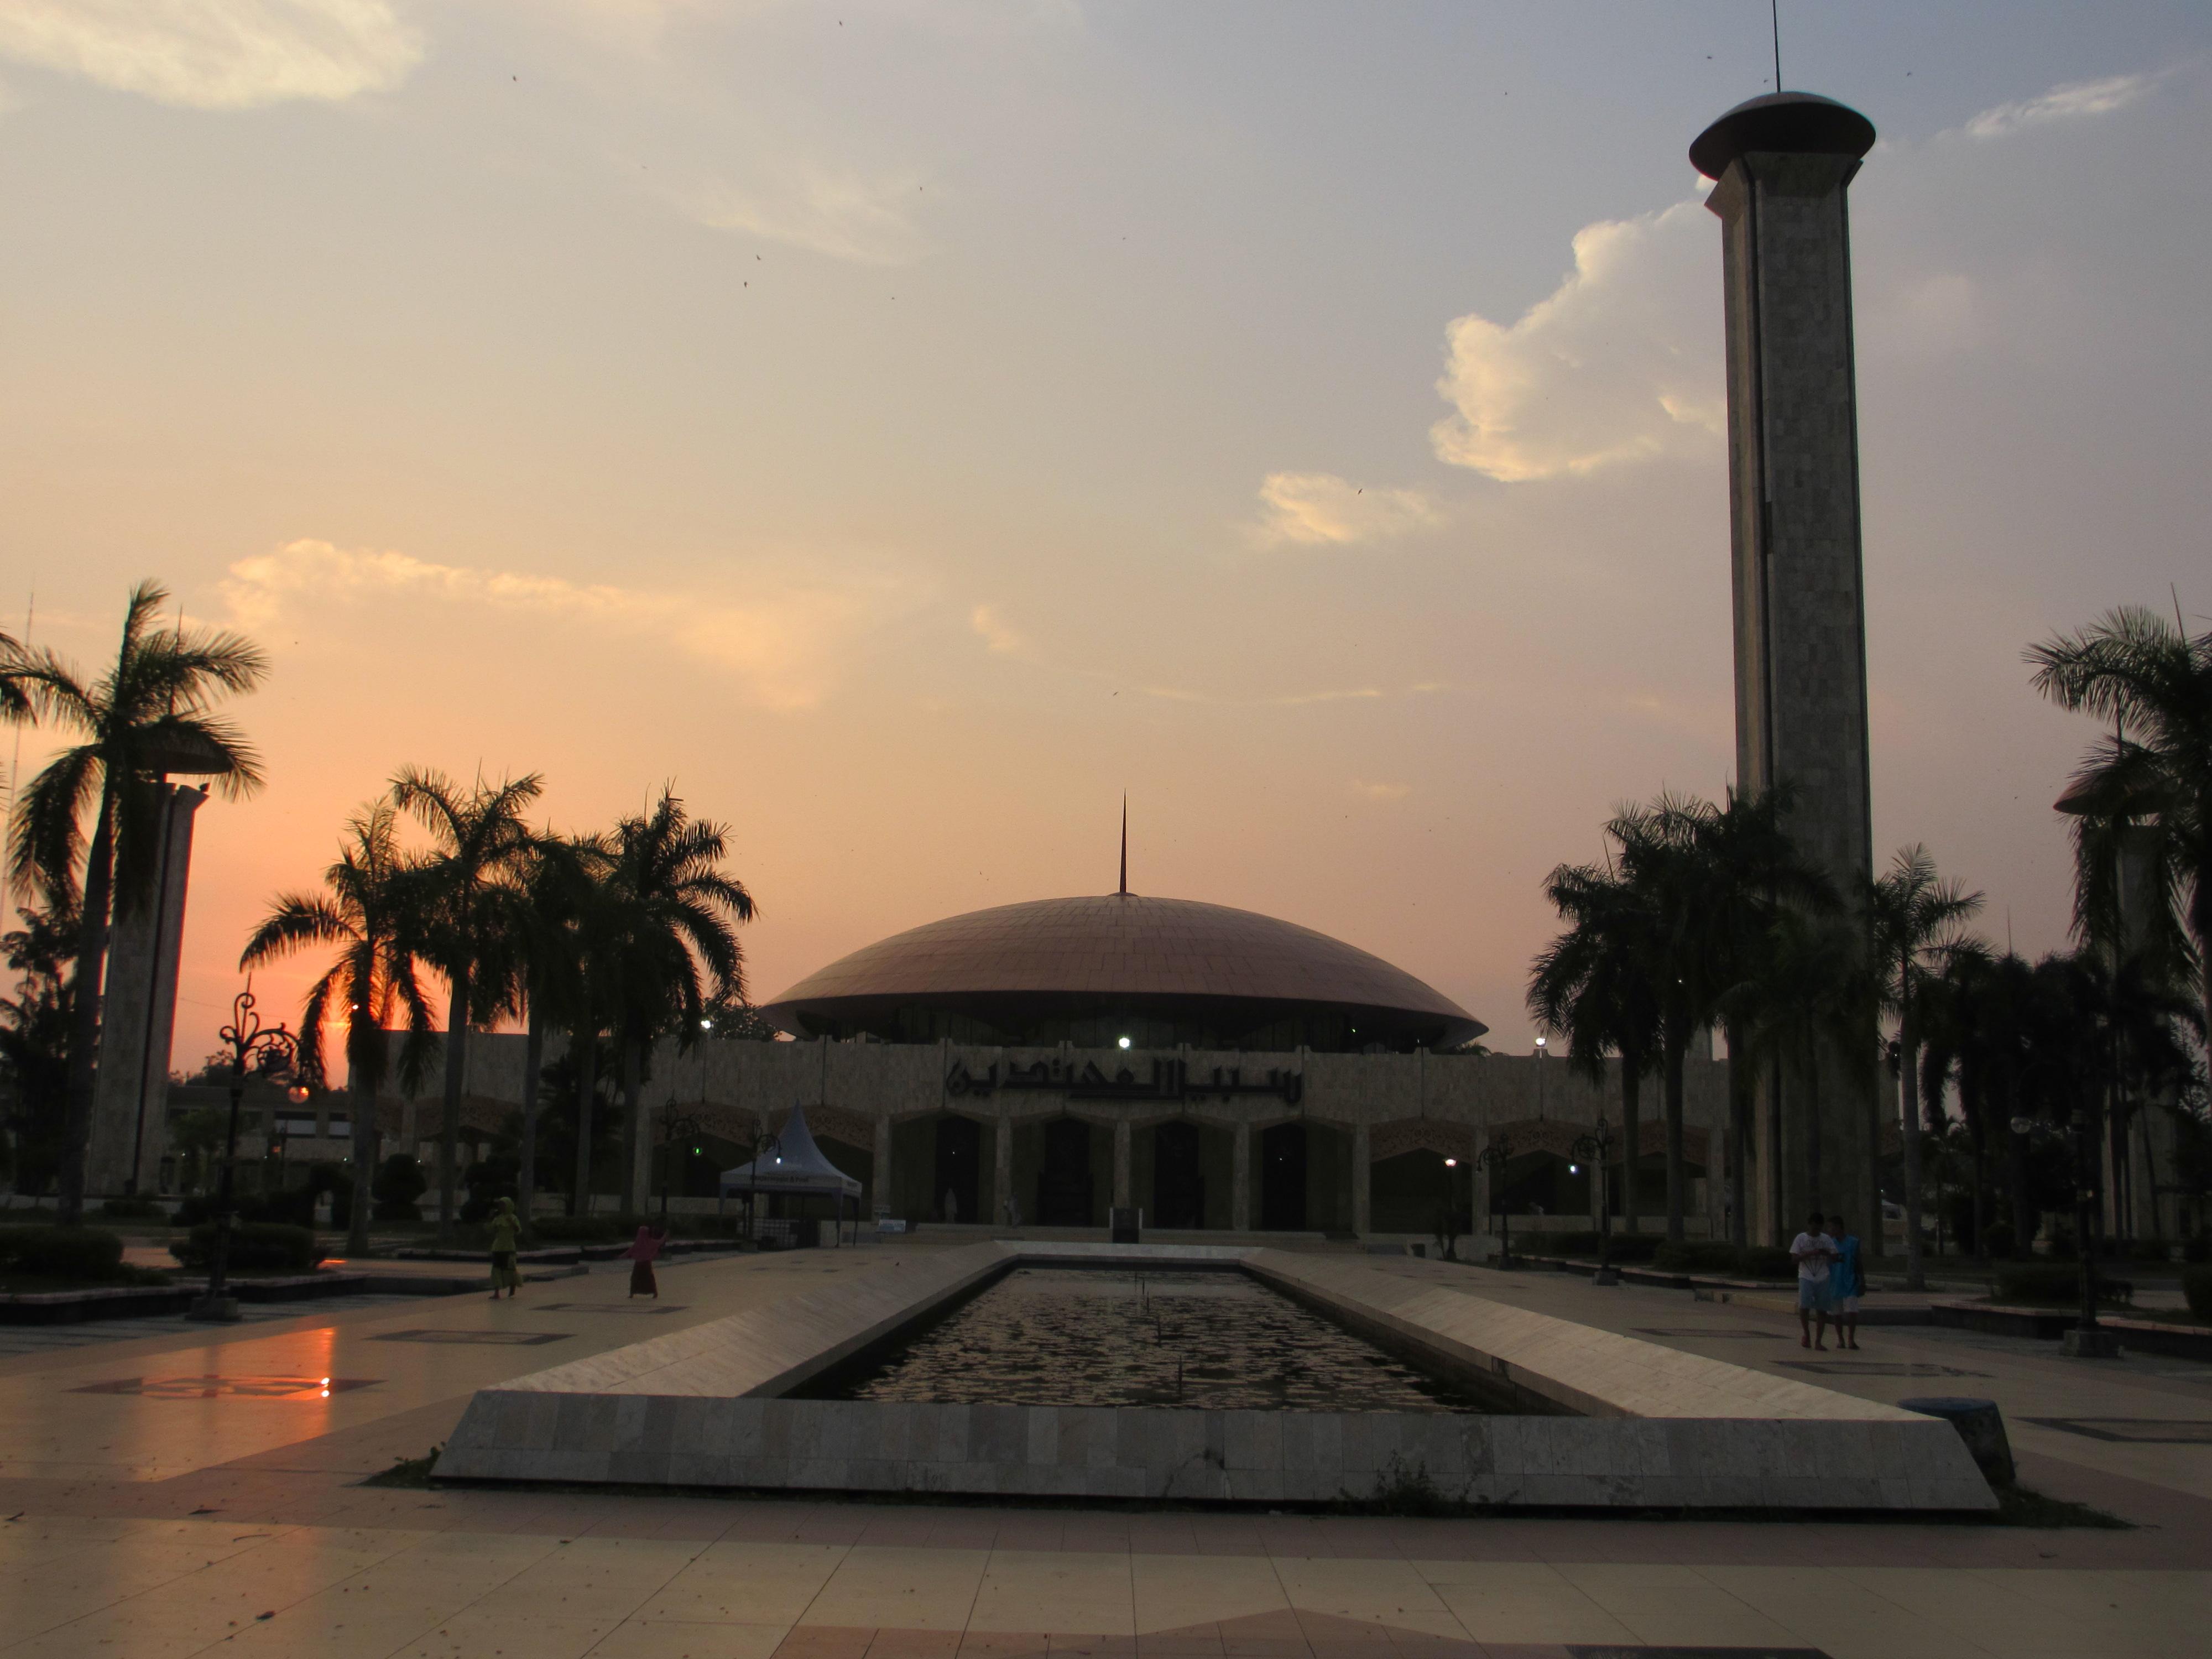 Banjar Baksobentuklove Masjid Sabilal Muhtadin Taman Maskot Kab Banjarmasin